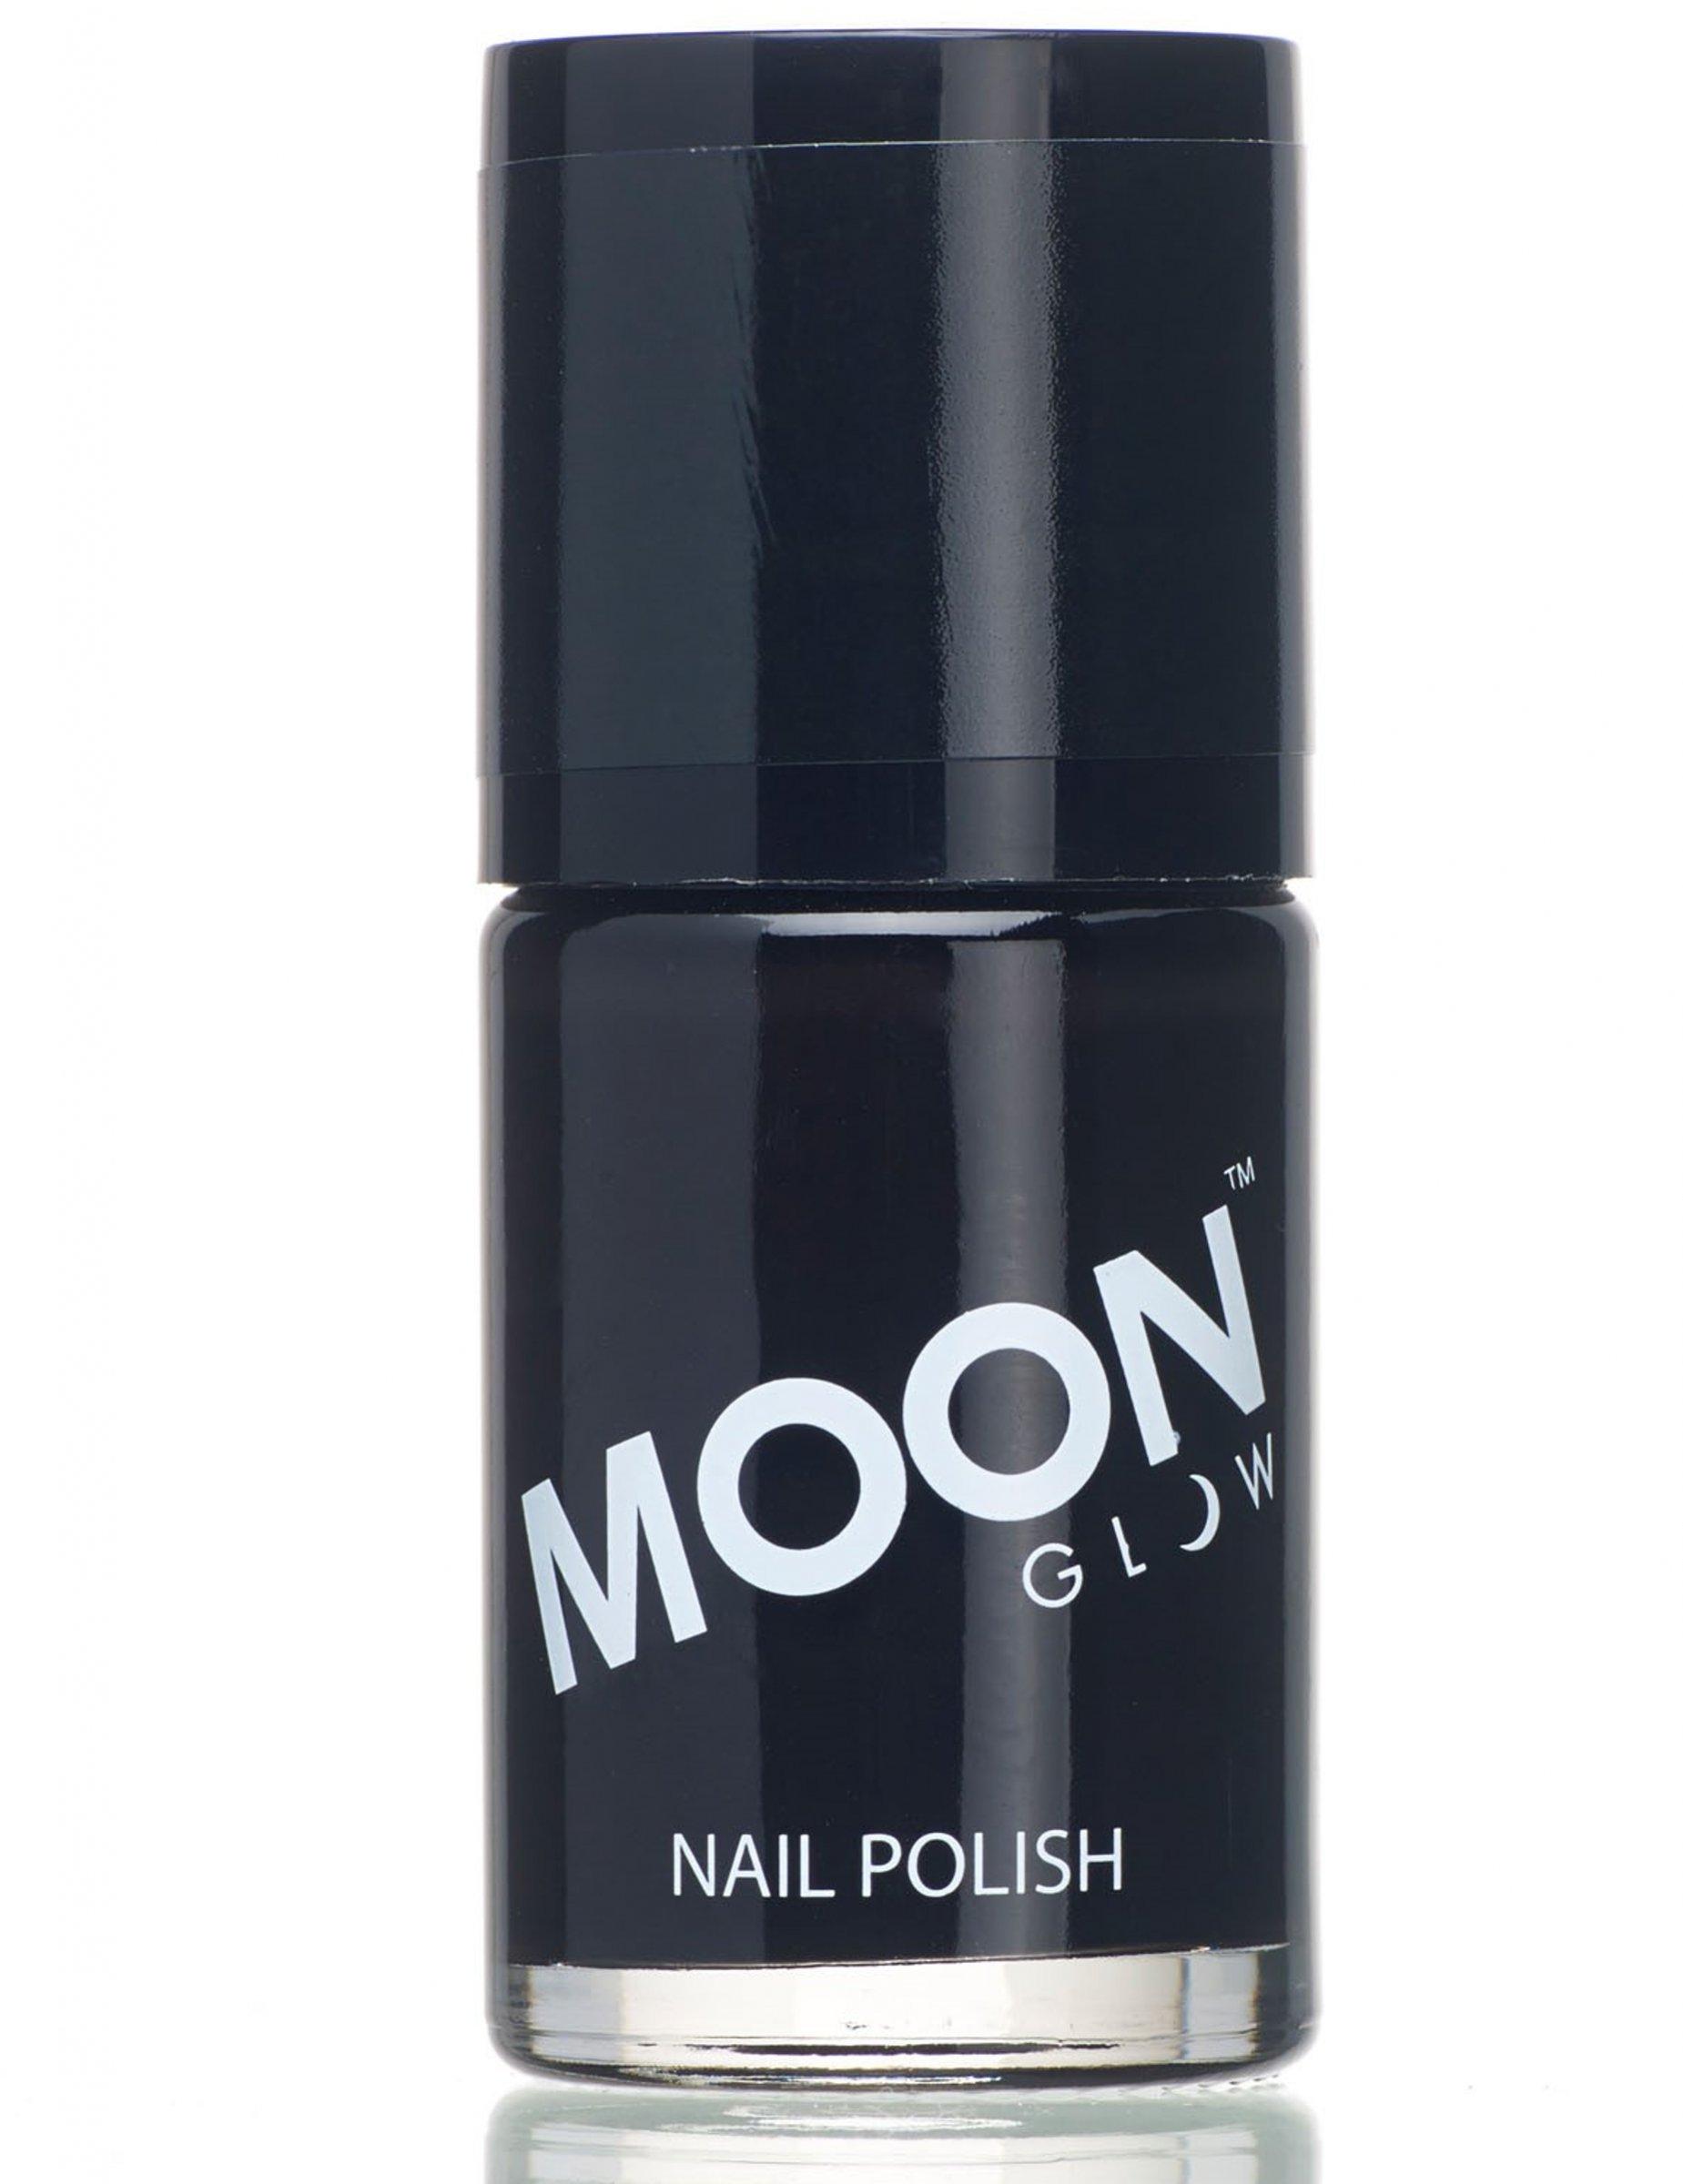 Vernis ongles noir uv 15 ml moonglow deguise toi achat de maquillage - Vernis a ongle noir ...